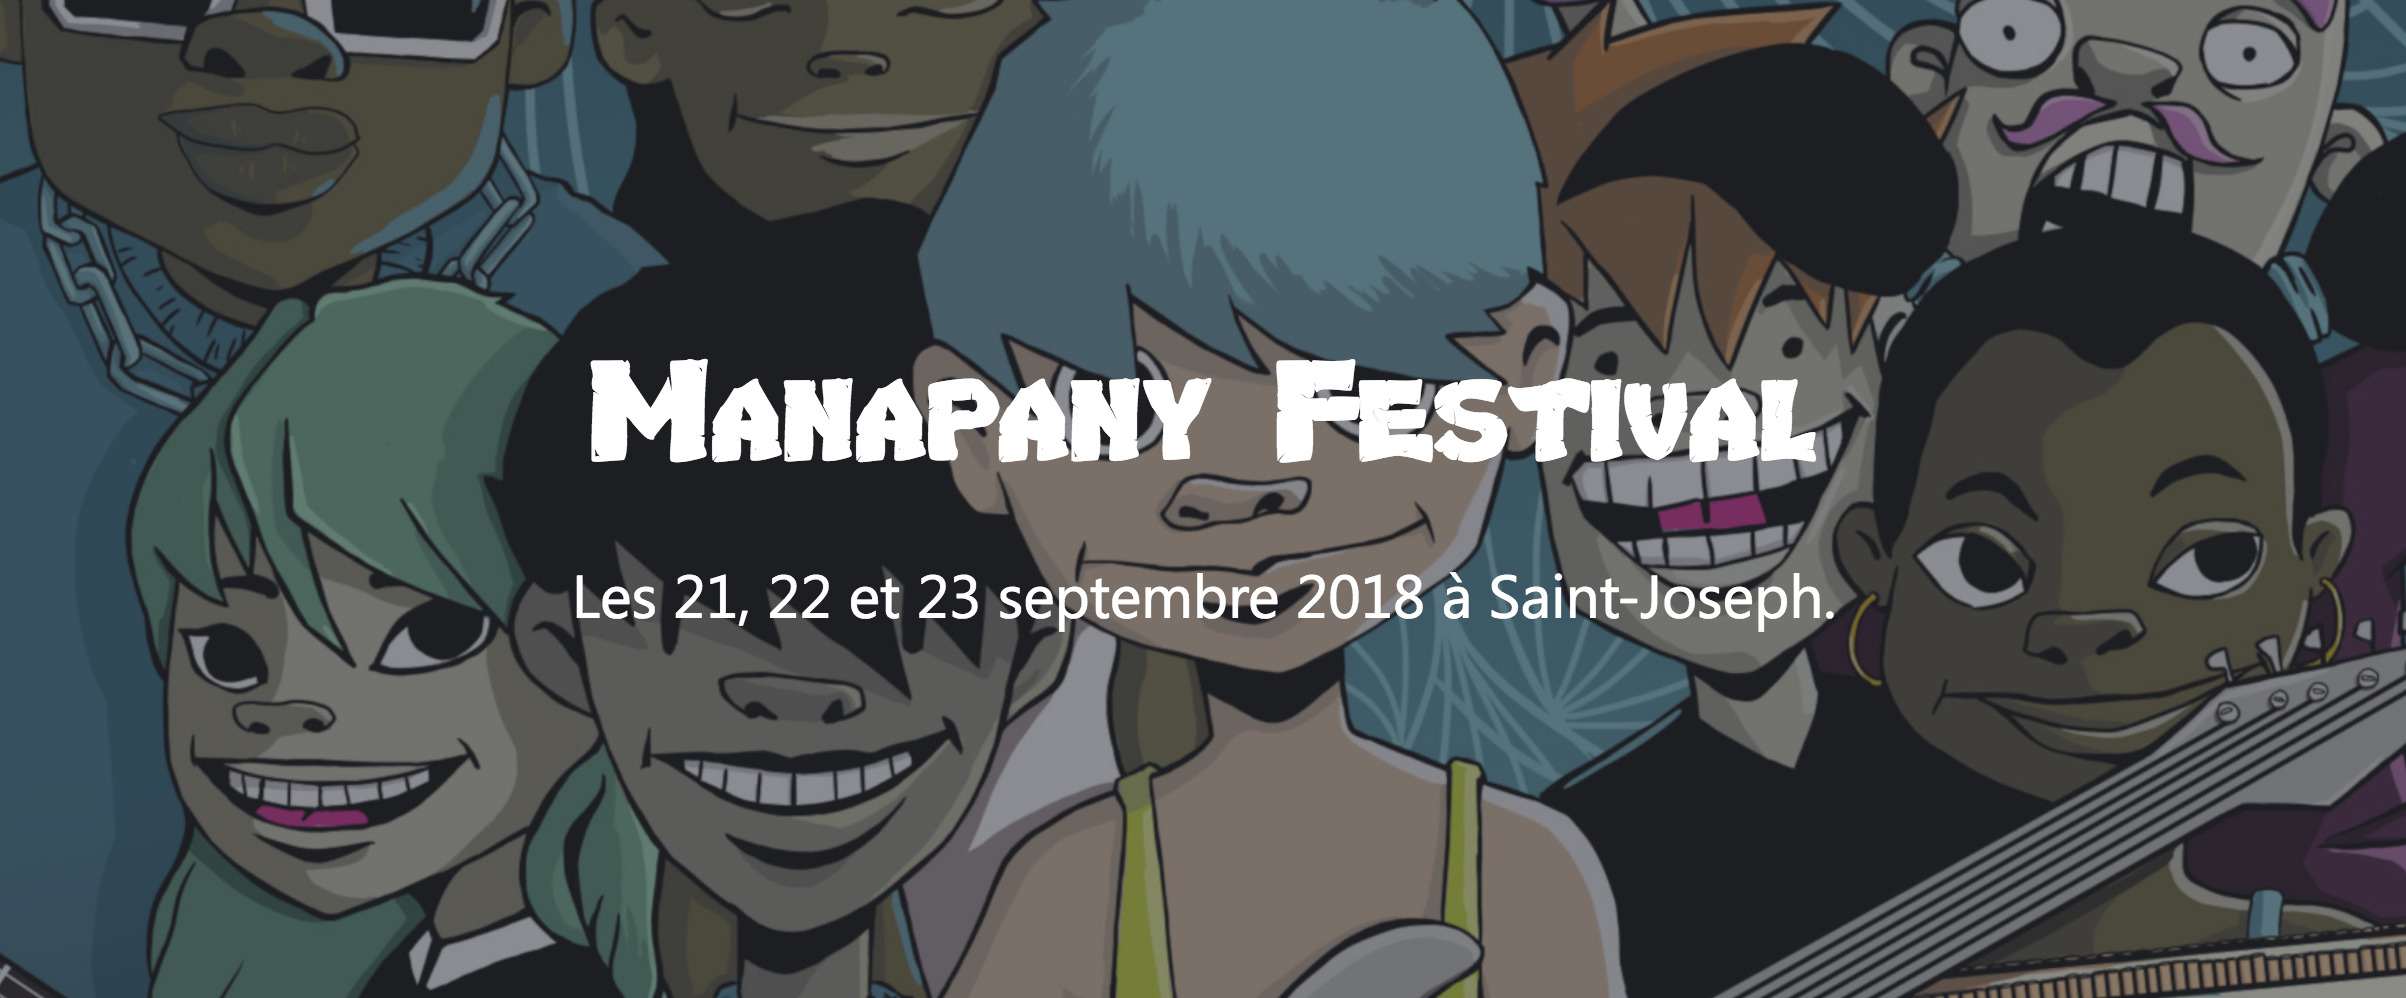 Bandeau-Manapany-Festival-2018